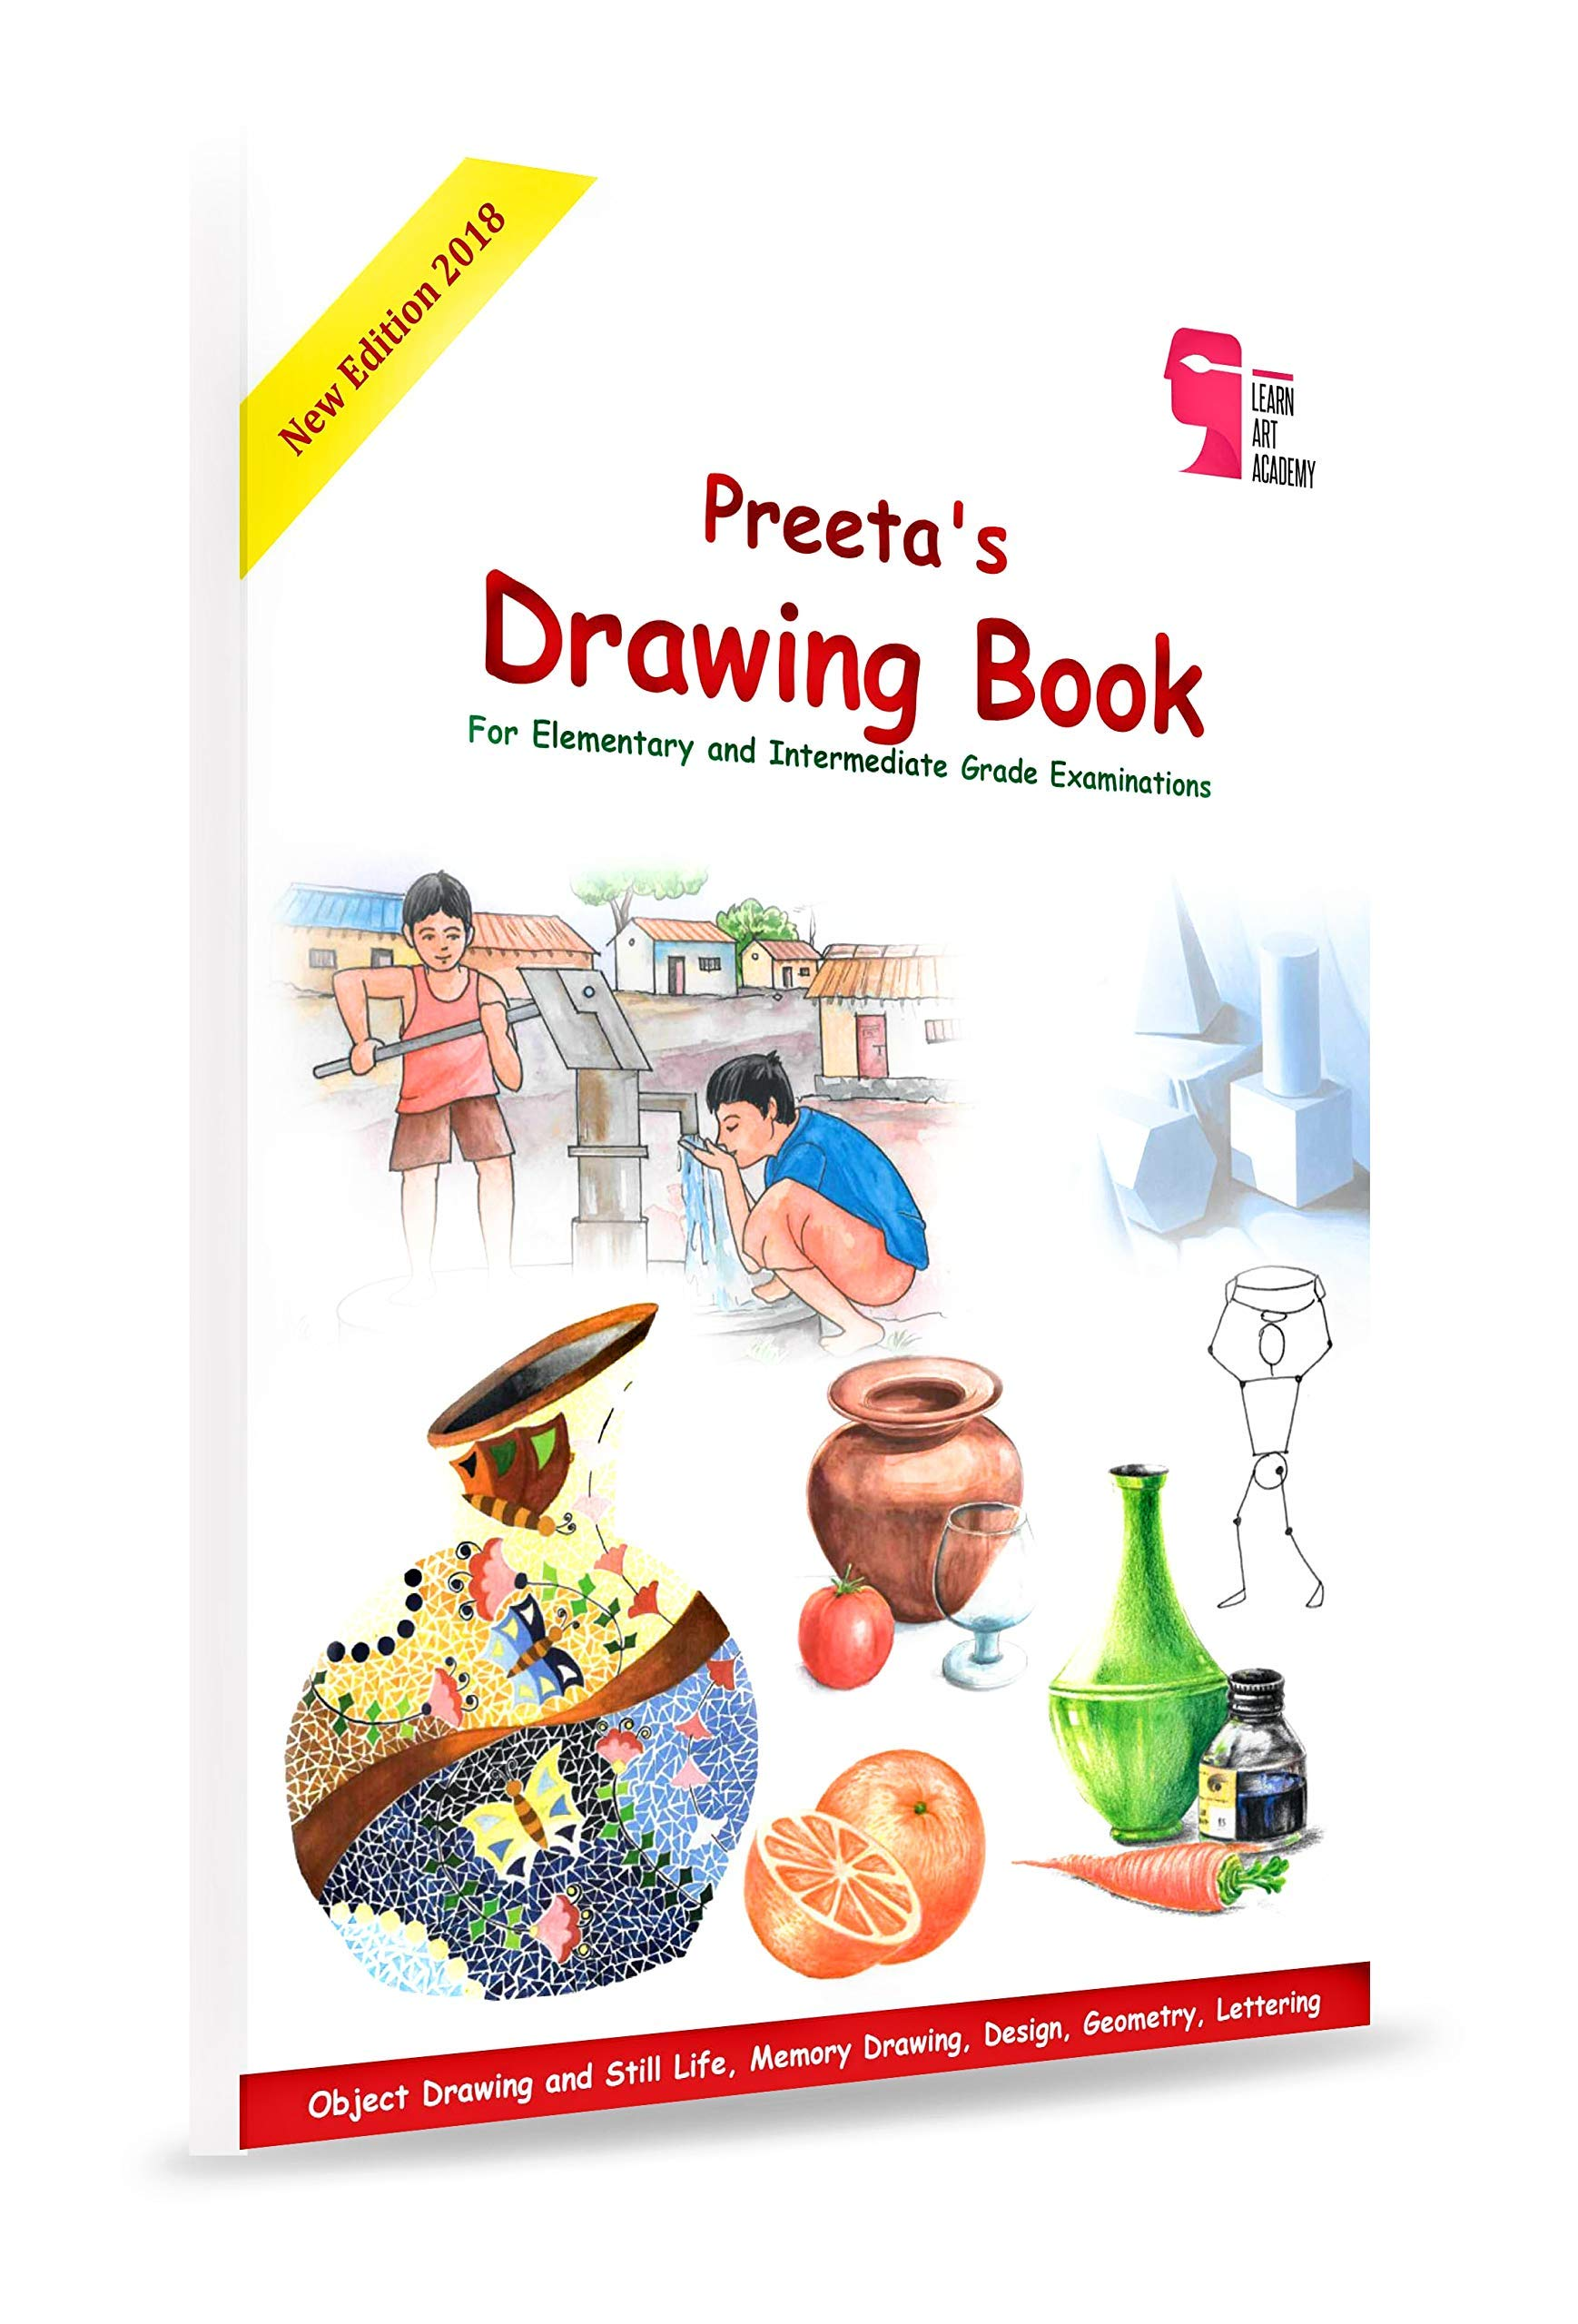 Buy Preeta's Drawing Book for Elementary and Intermediate